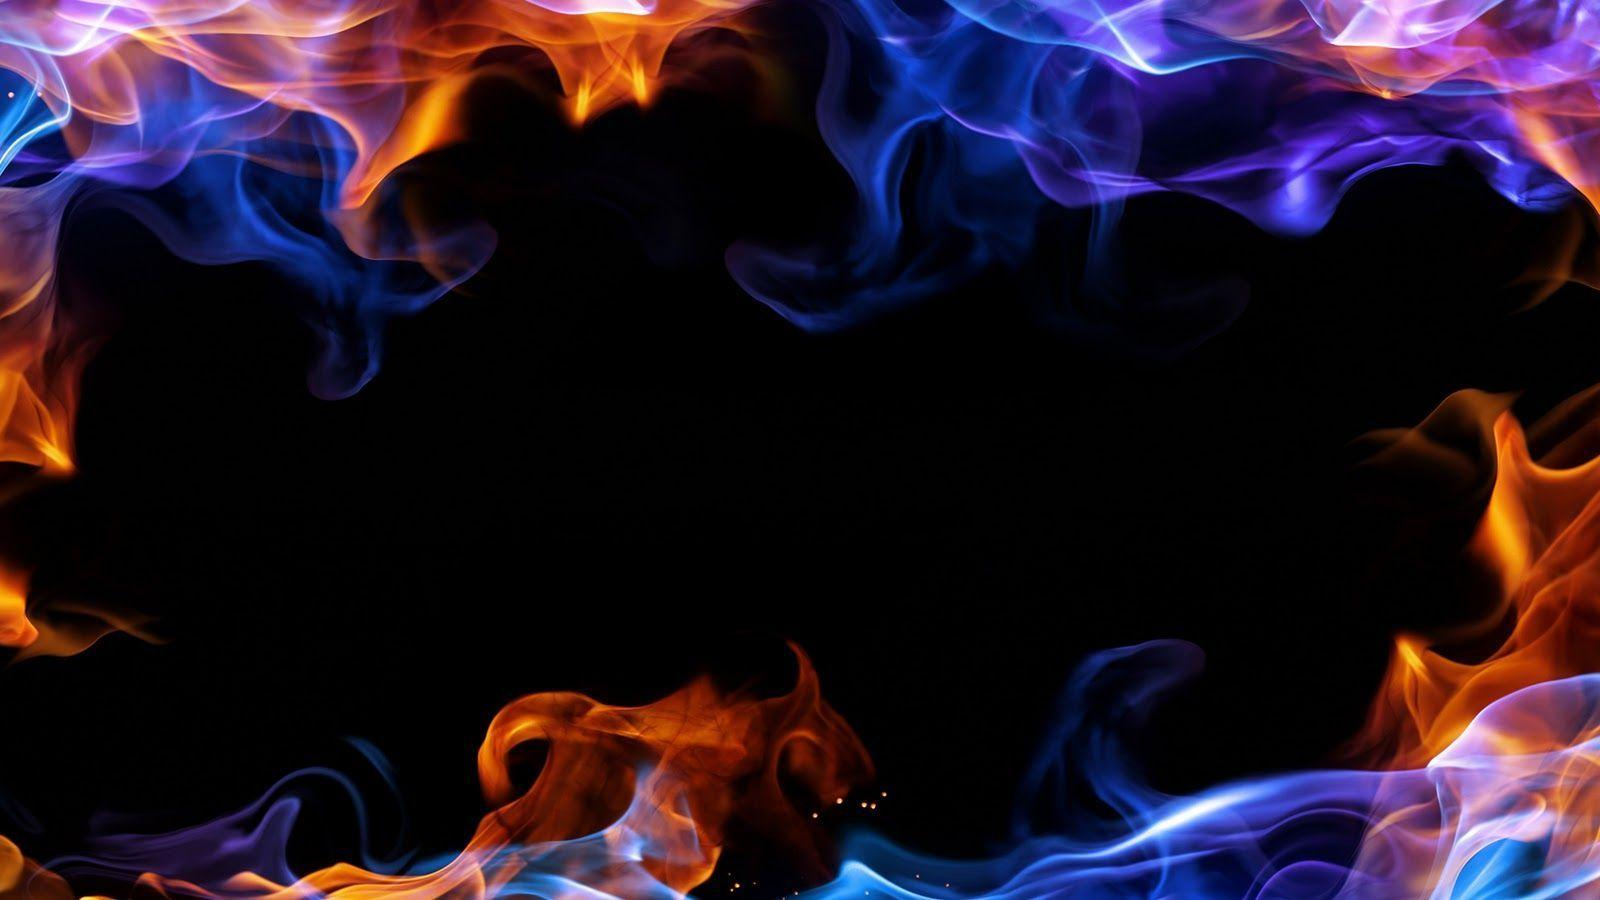 Fire Wallpapers Hd Wallpaper Cave